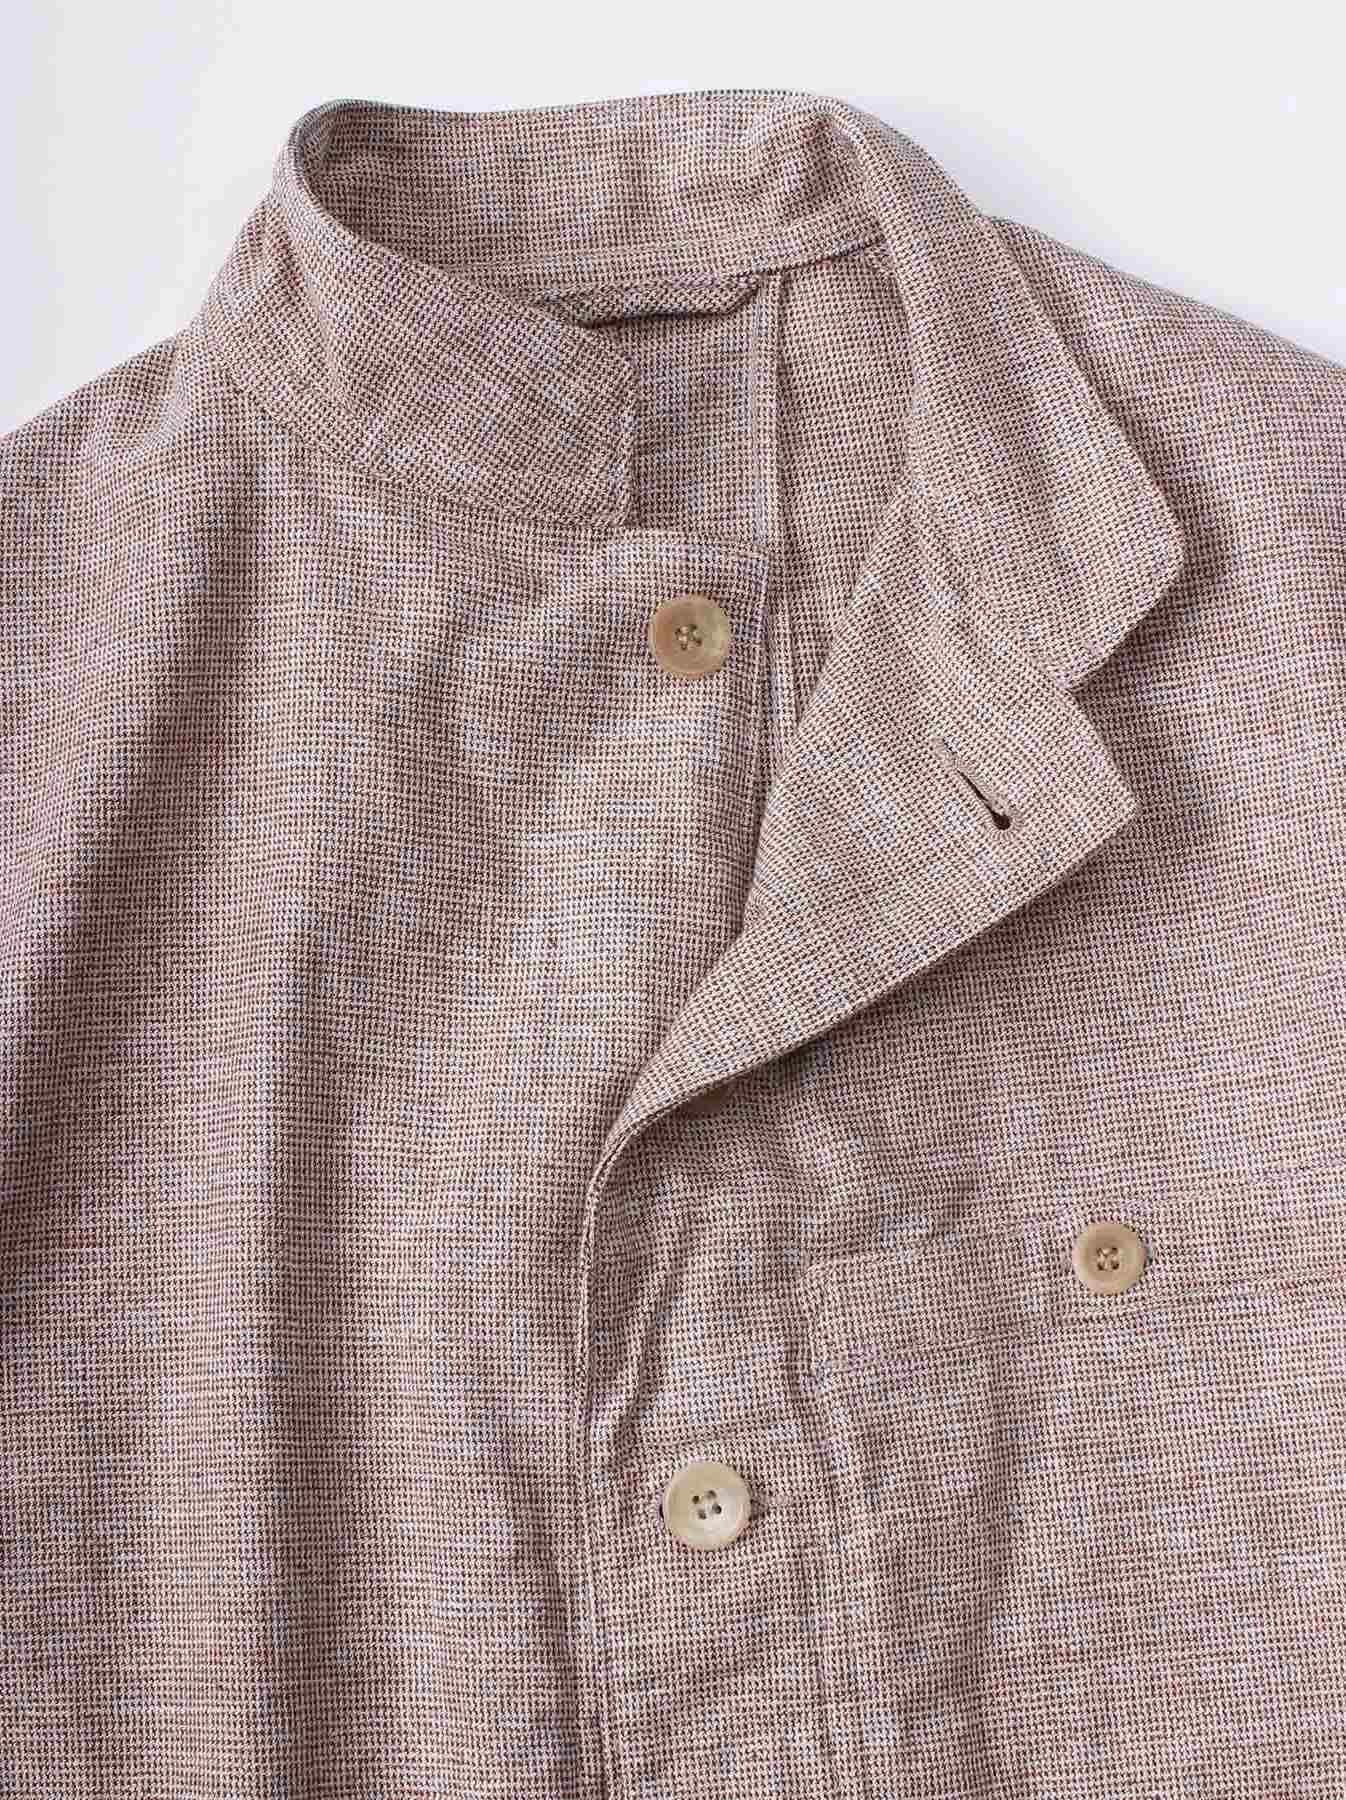 Cotton Tweed 908 Jacket-7